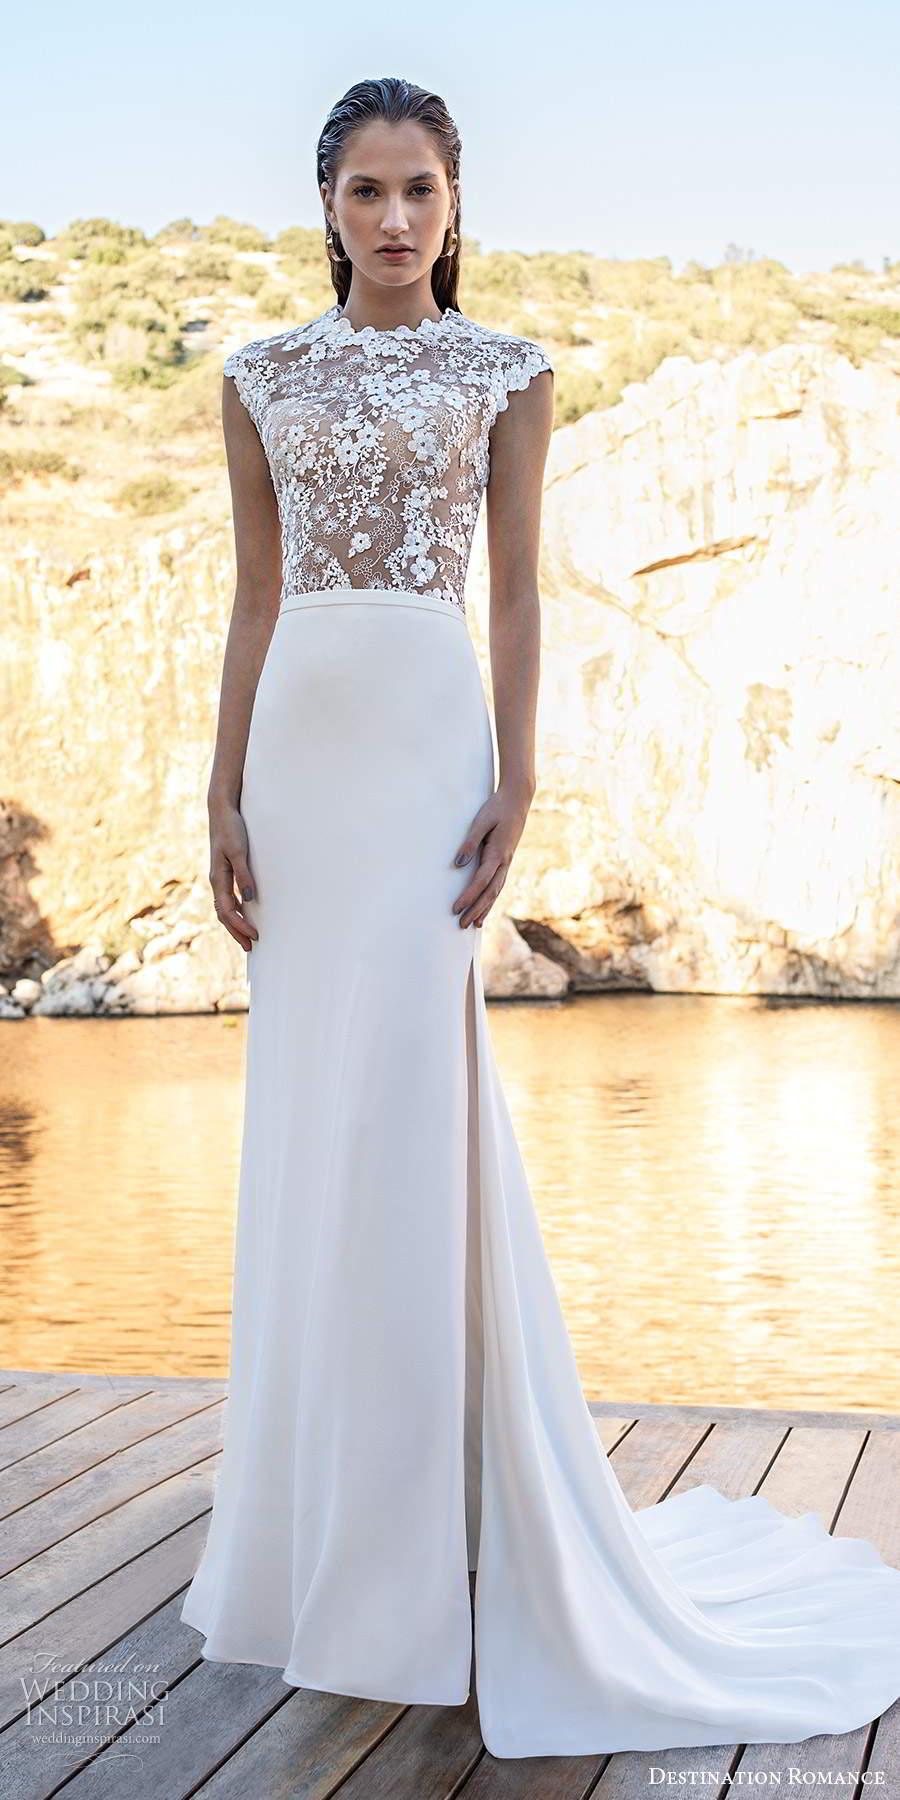 destination romance 2020 bridal cap sleeves jewel neckline lace bodice clean skirt sheath column wedding dress chapel train (14) mv